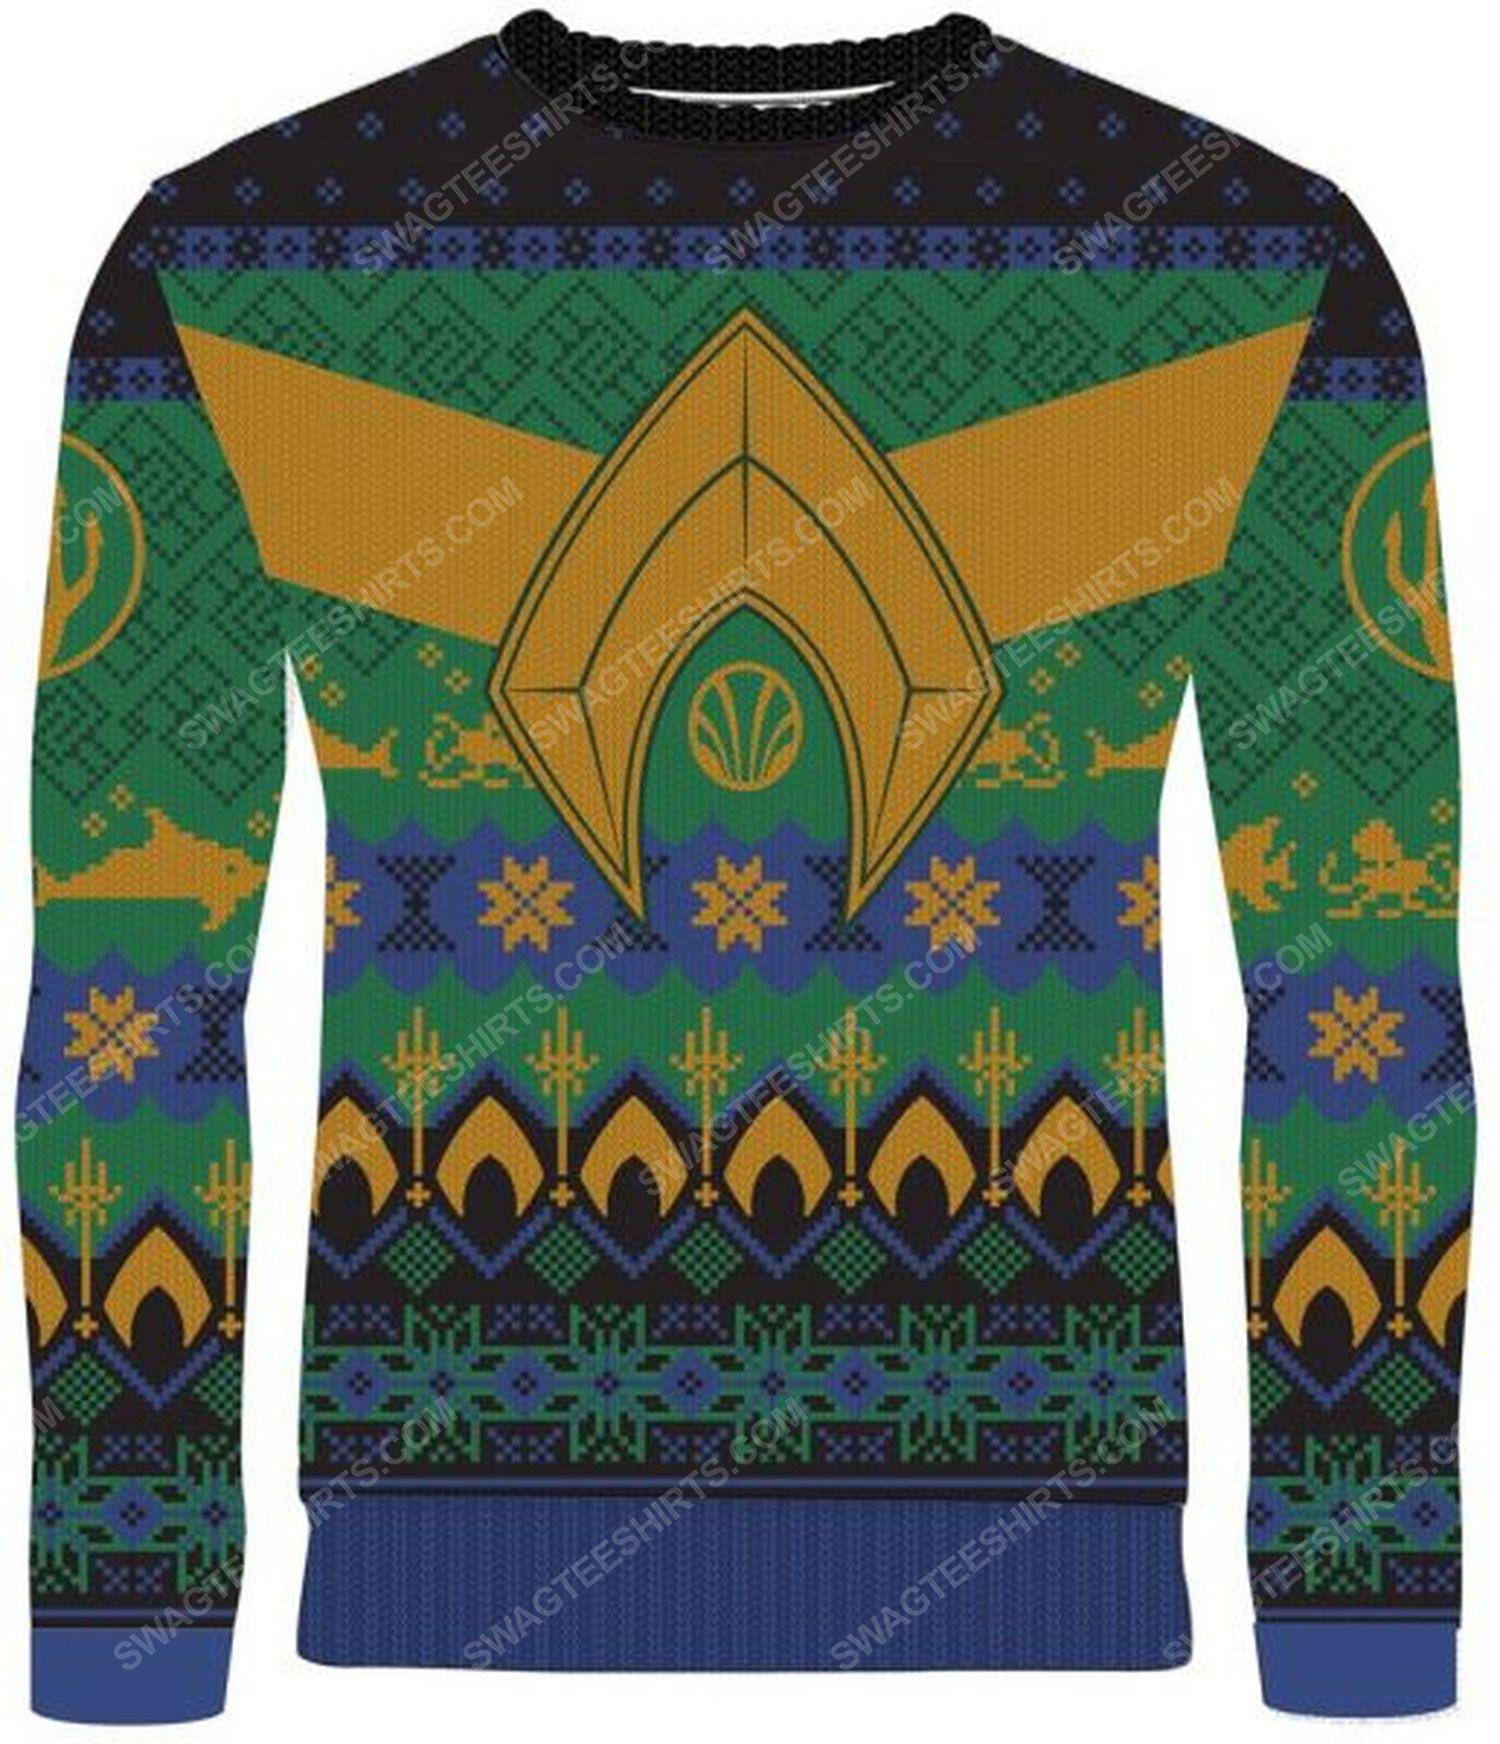 Atlantean tidings full print ugly christmas sweater 2 - Copy (2)